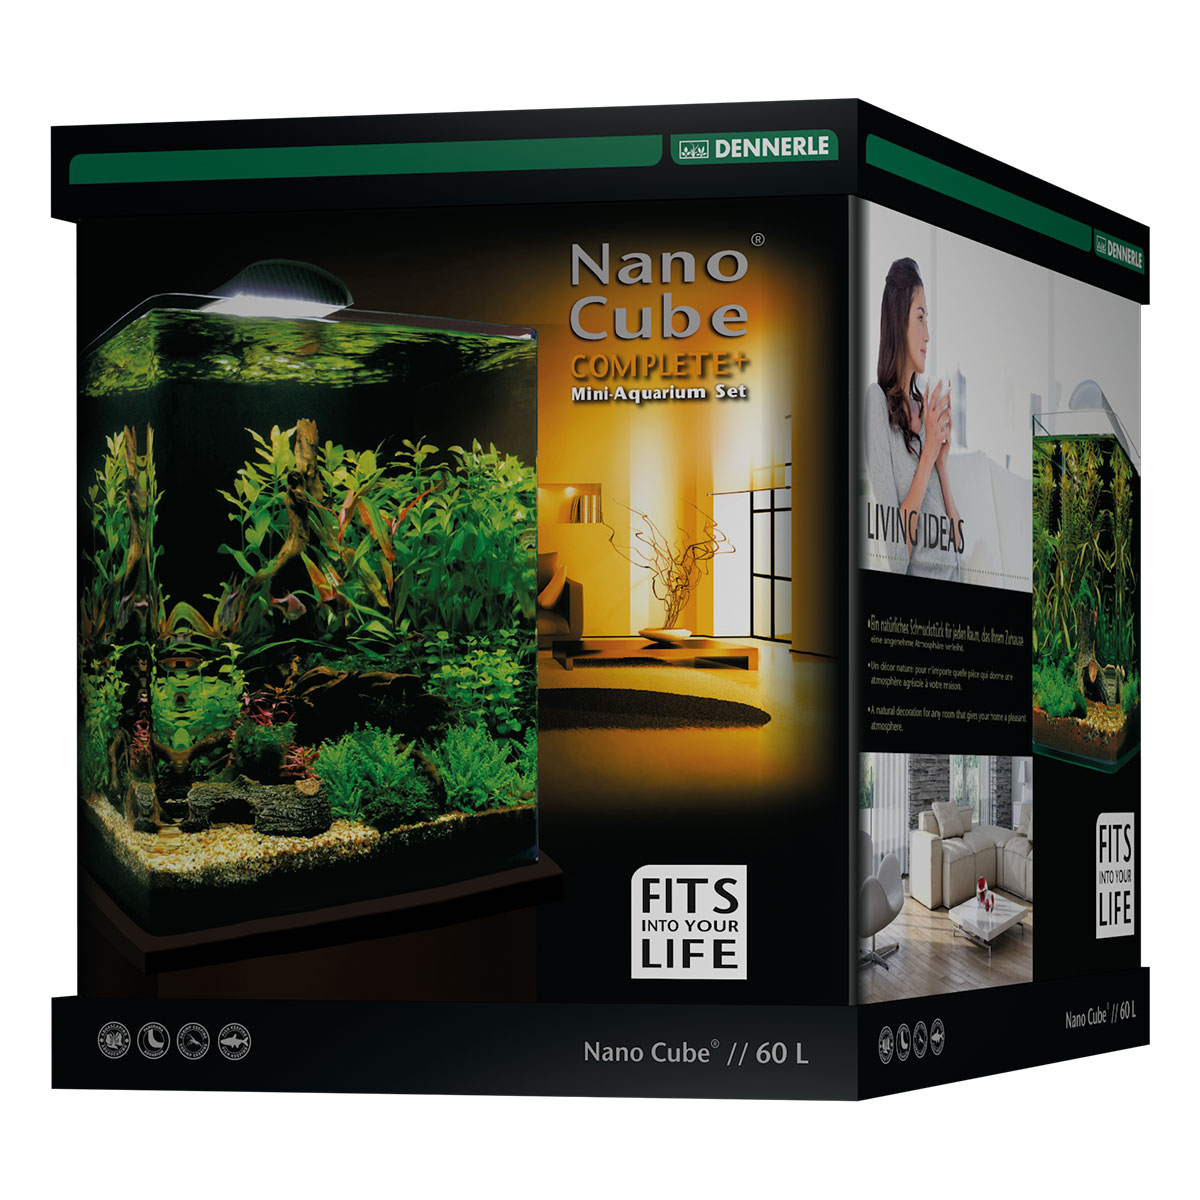 dennerle nanocube complete plus 60l aquarium set bei zooroyal. Black Bedroom Furniture Sets. Home Design Ideas